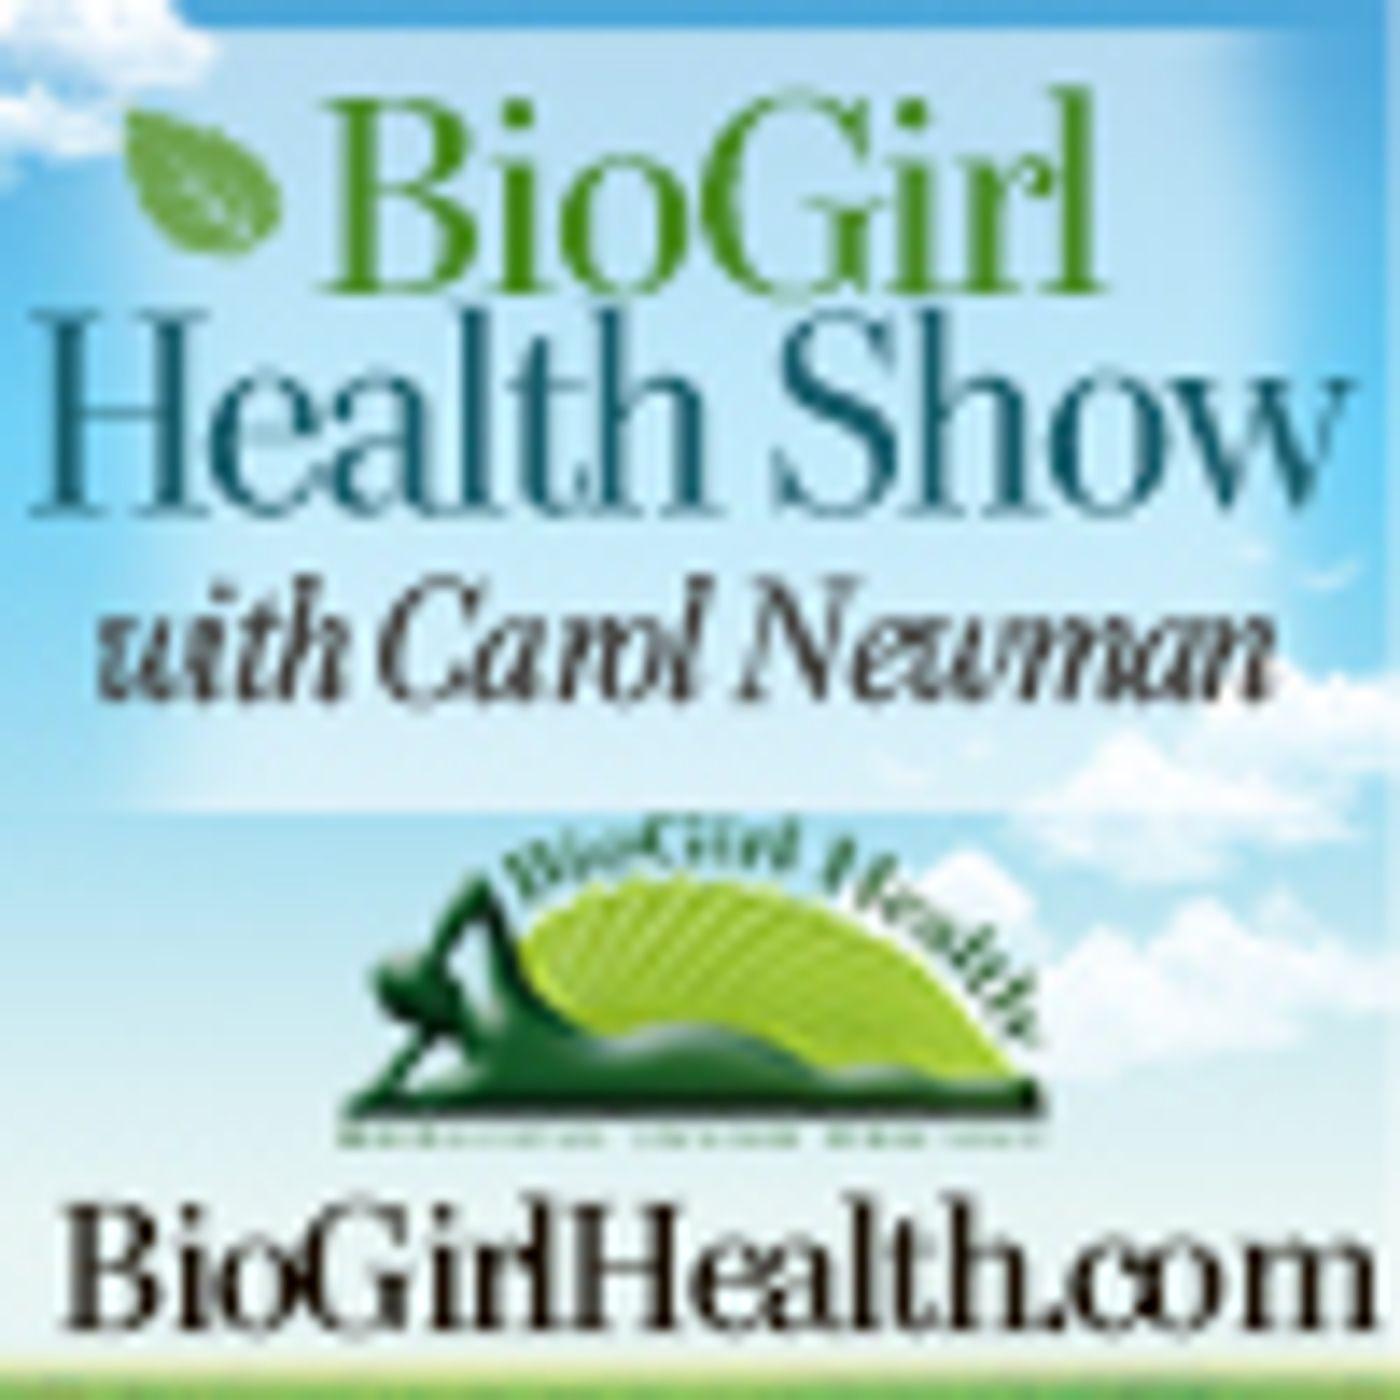 BioGirl Health Show